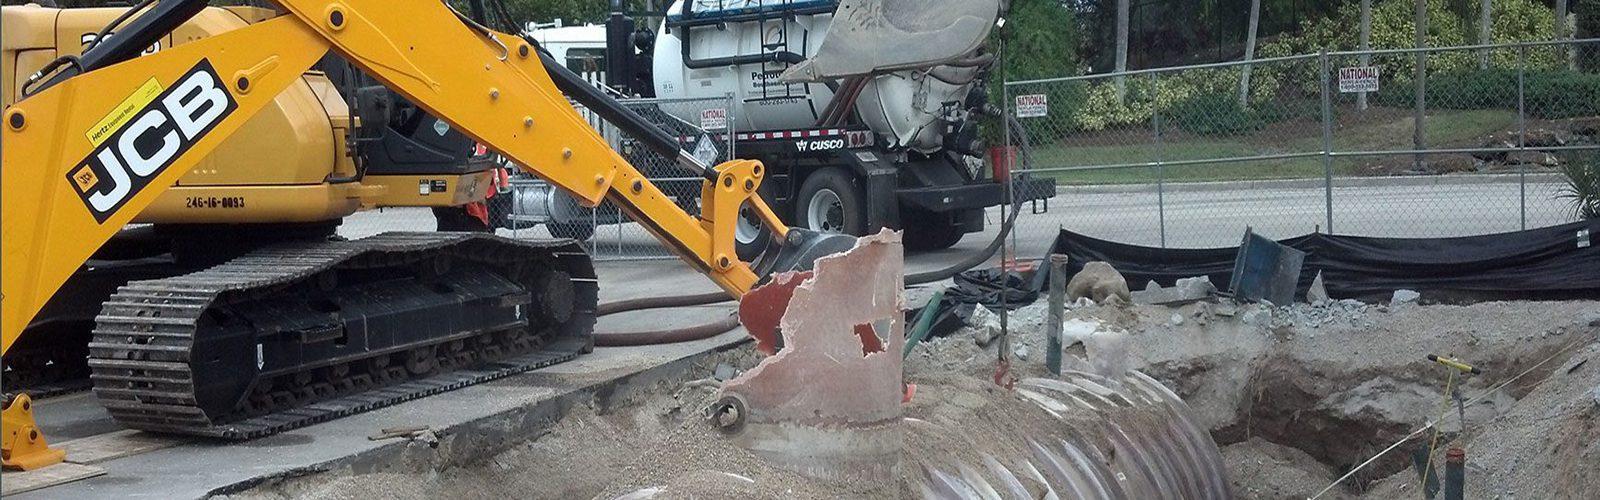 Removing old storage tank